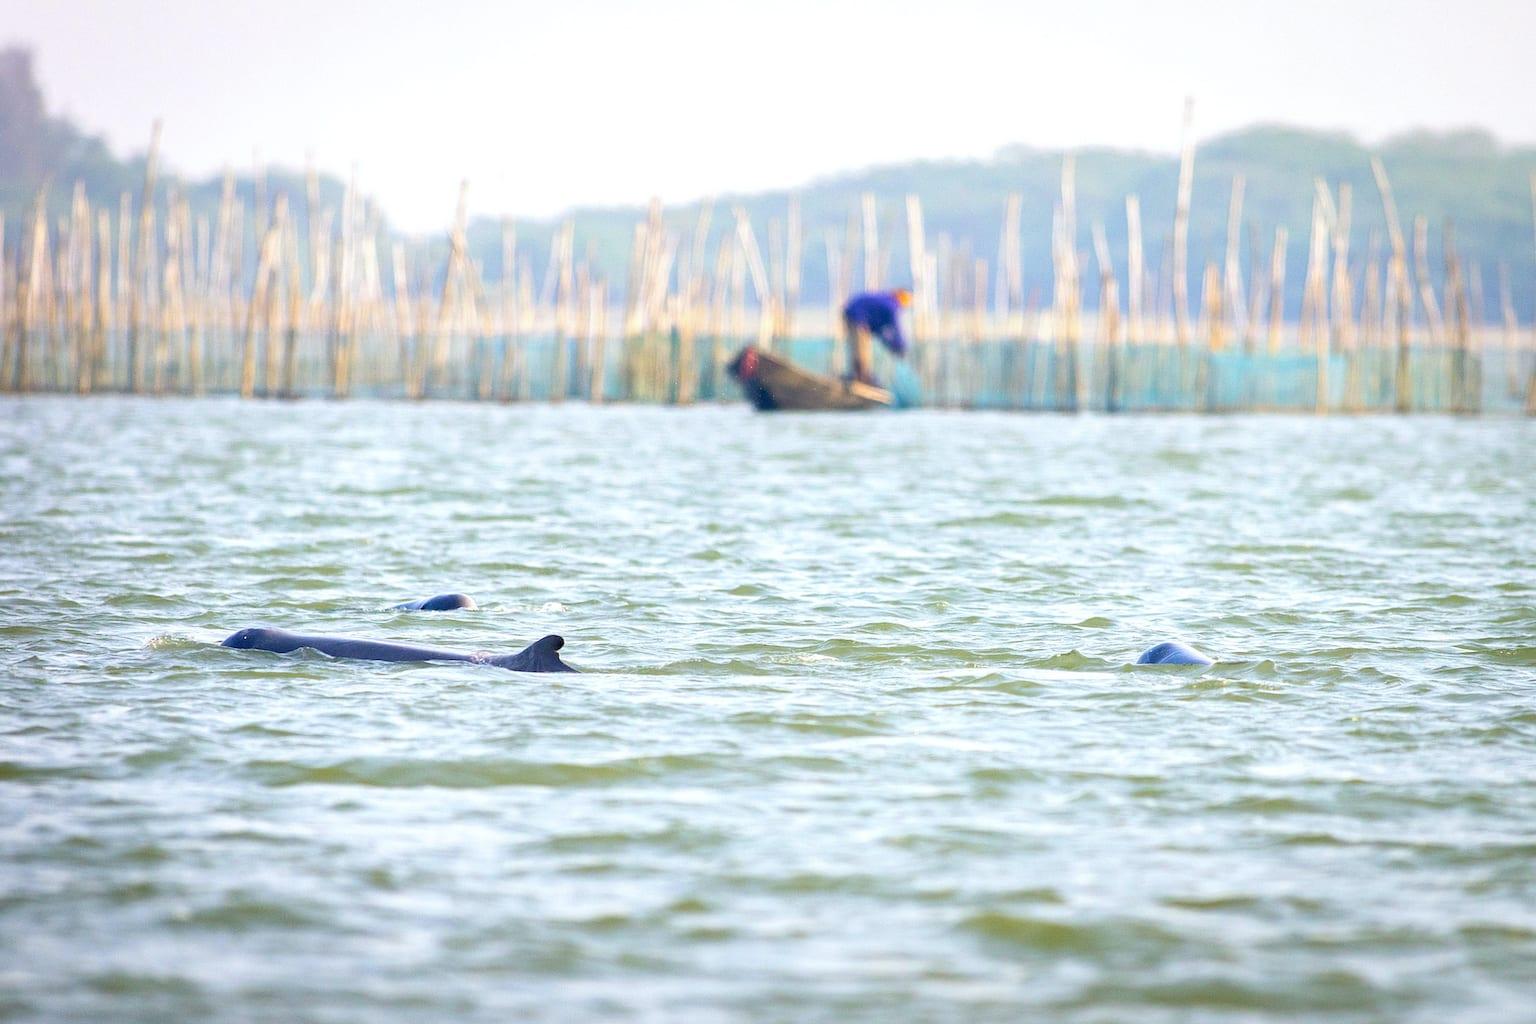 Irrawaddy dolphins and fishermen at Chilika lake